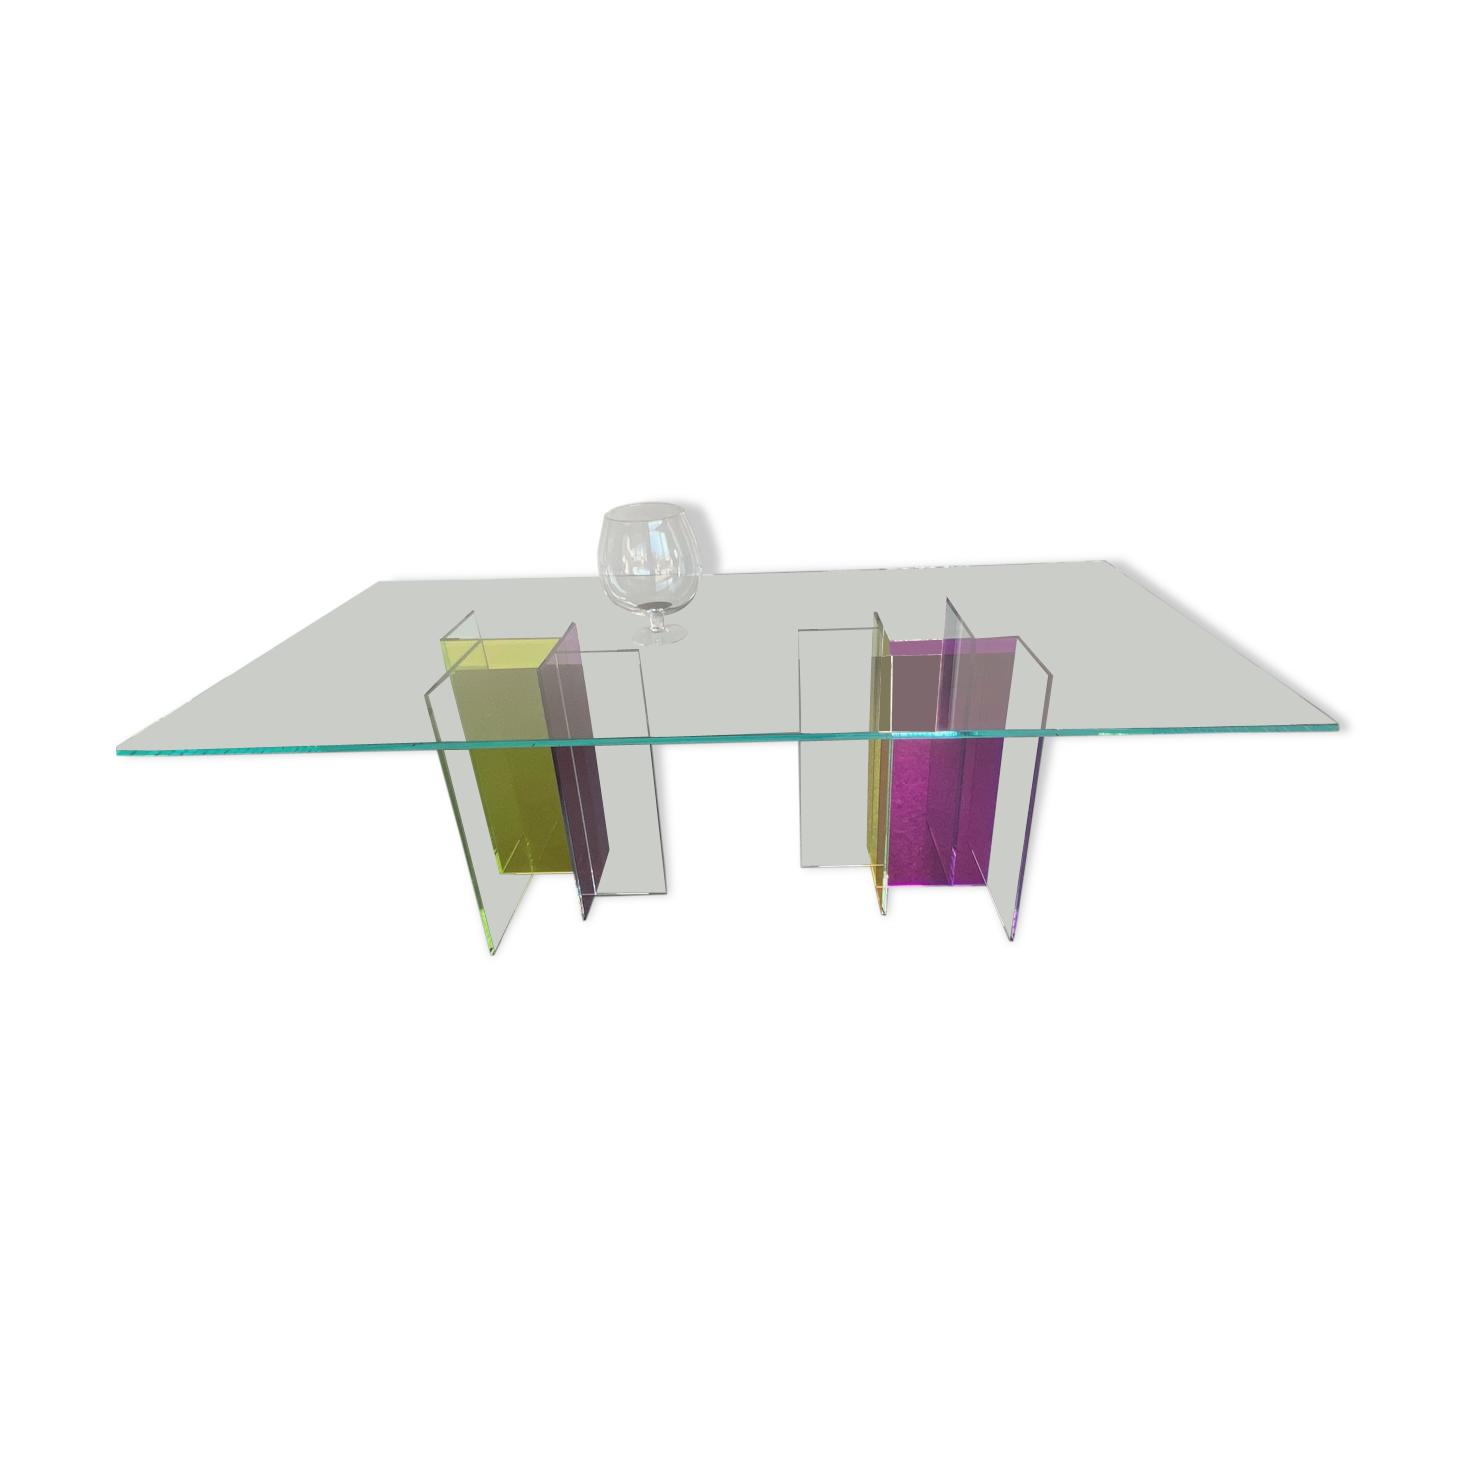 Table salle a manger Roche Bobois diapo verre 210 x110